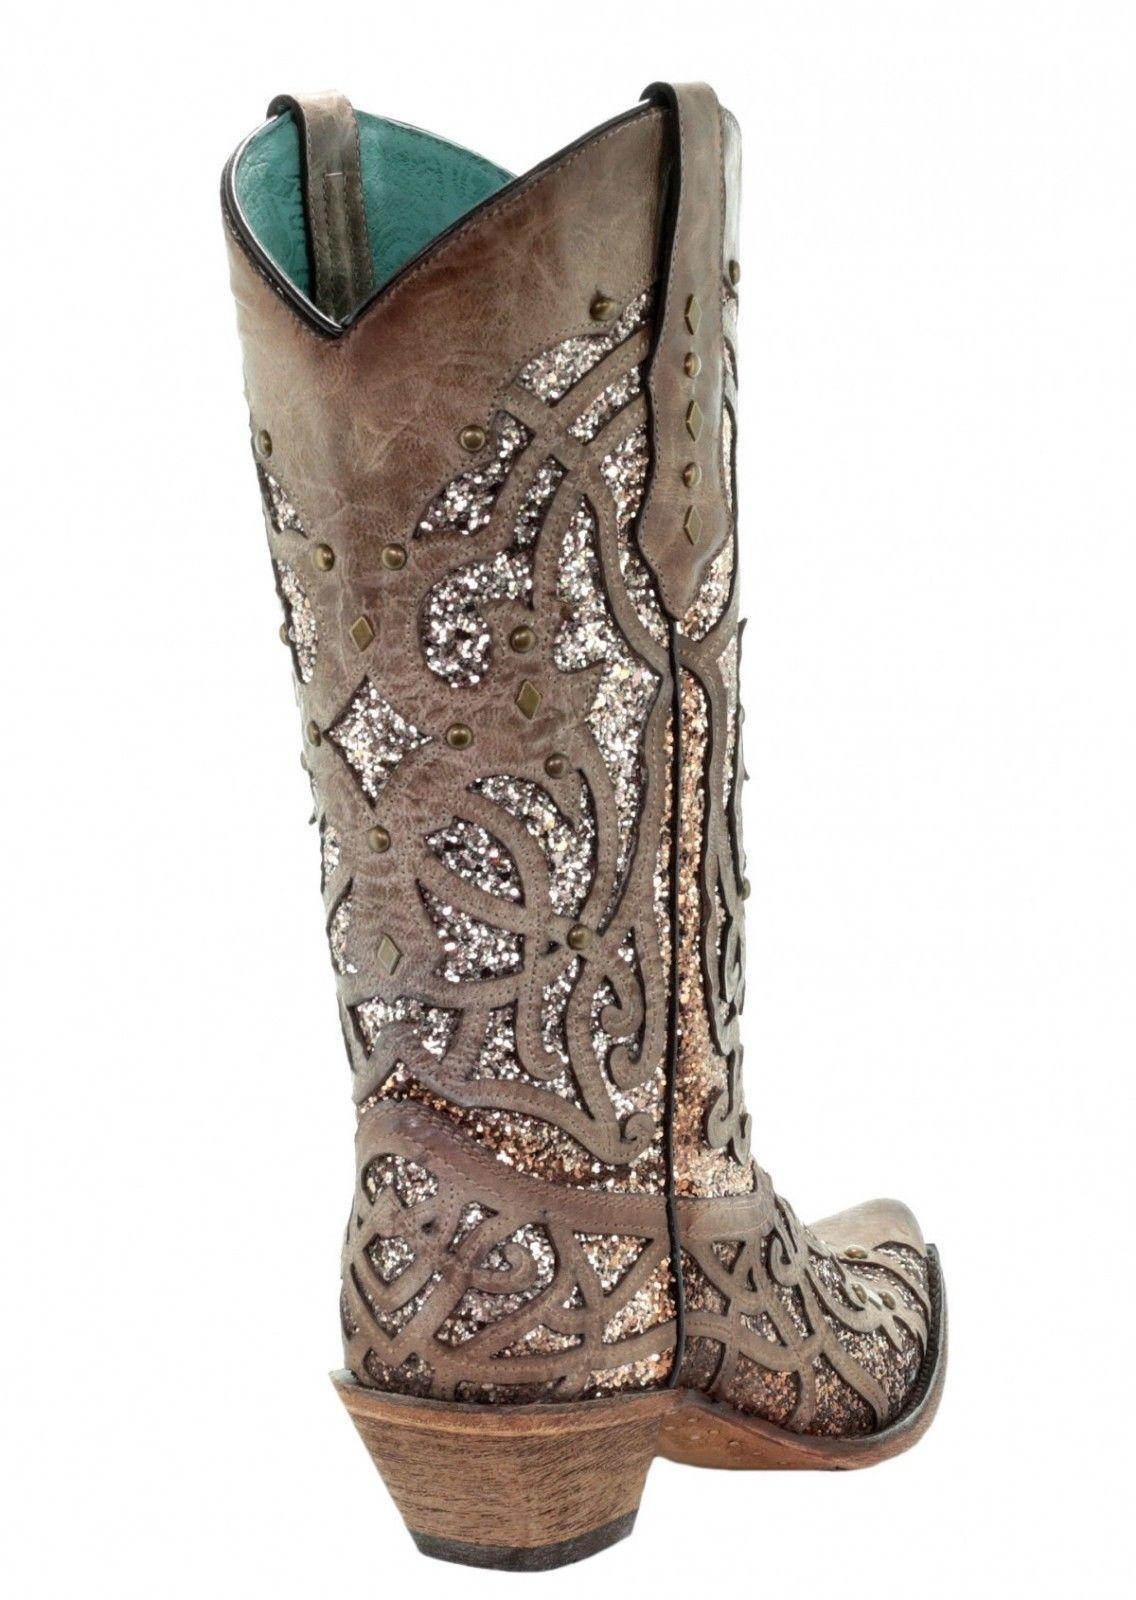 Corral Orix Glitter Inlay and Studs Studs Studs Snip Toe Western  Stiefel C3331 da0e1c